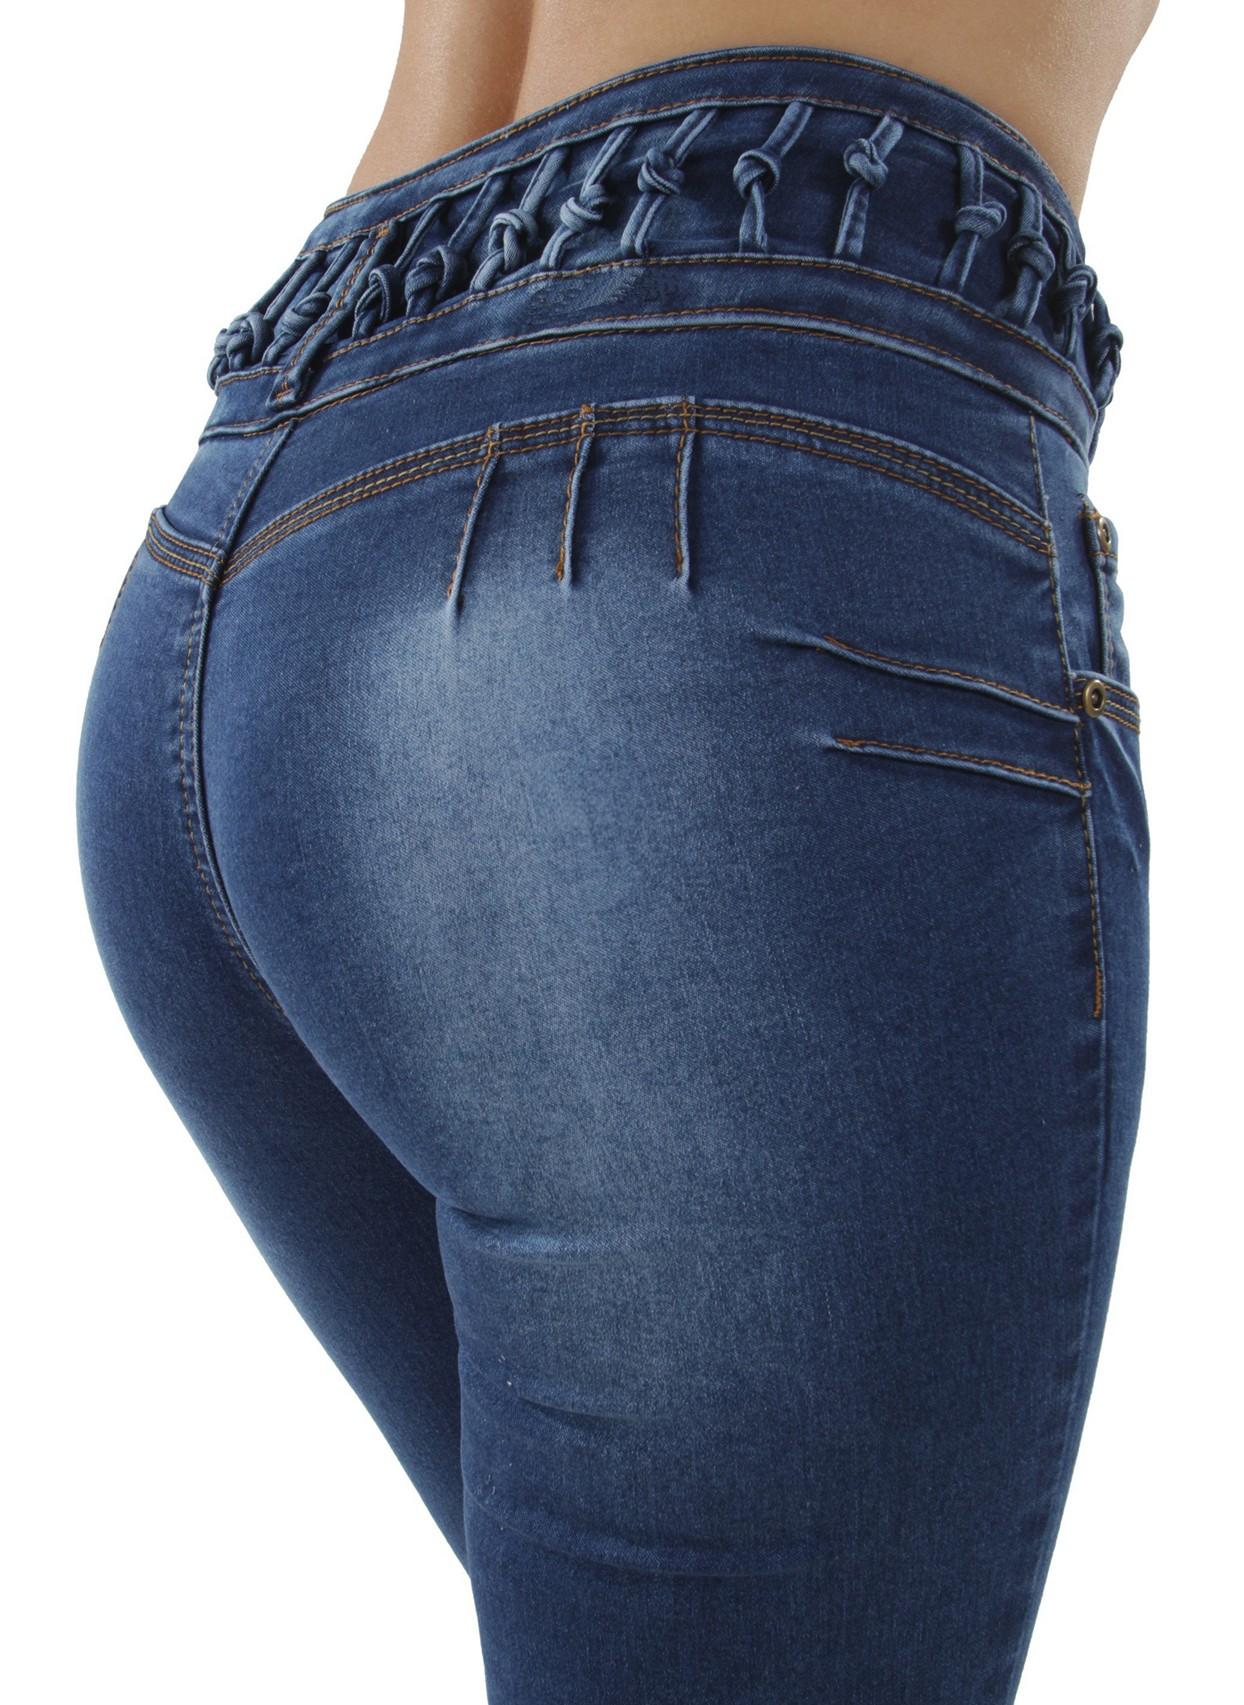 High Waist Skinny Denim Jeans ML2 Colombian Design Butt Lift Push Up Mid